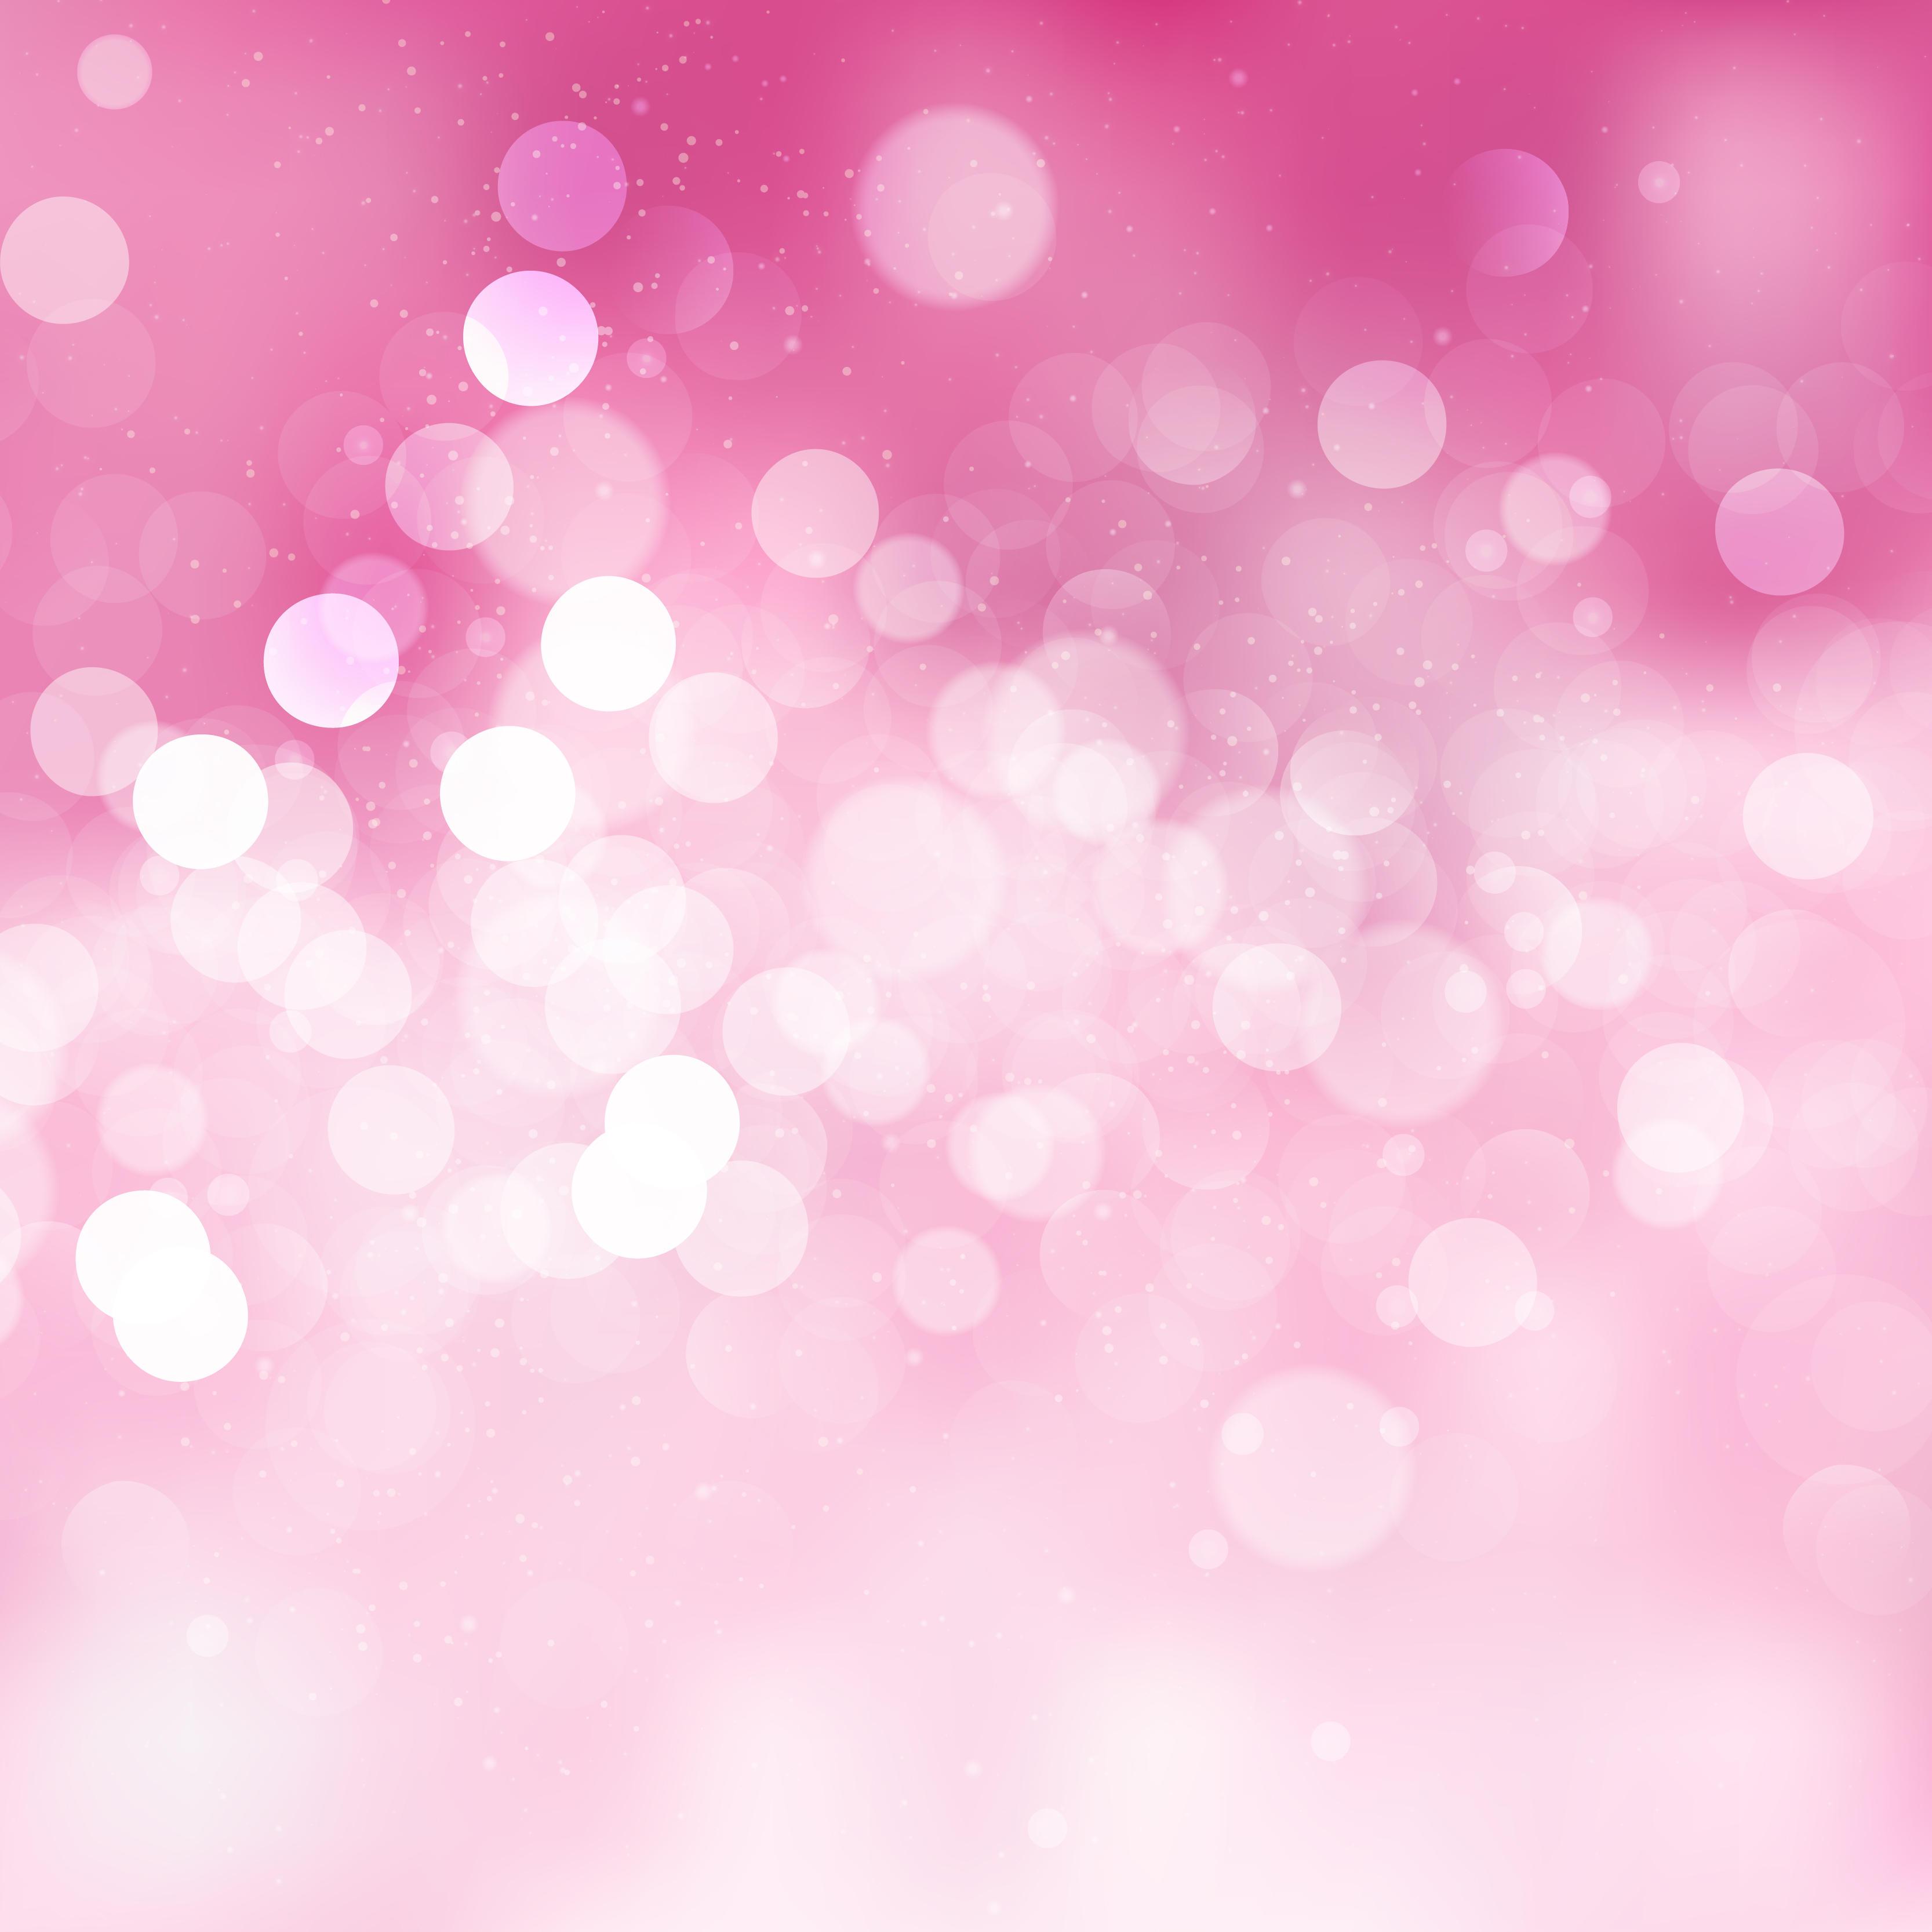 Abstract Light Pink Bokeh Backdrop